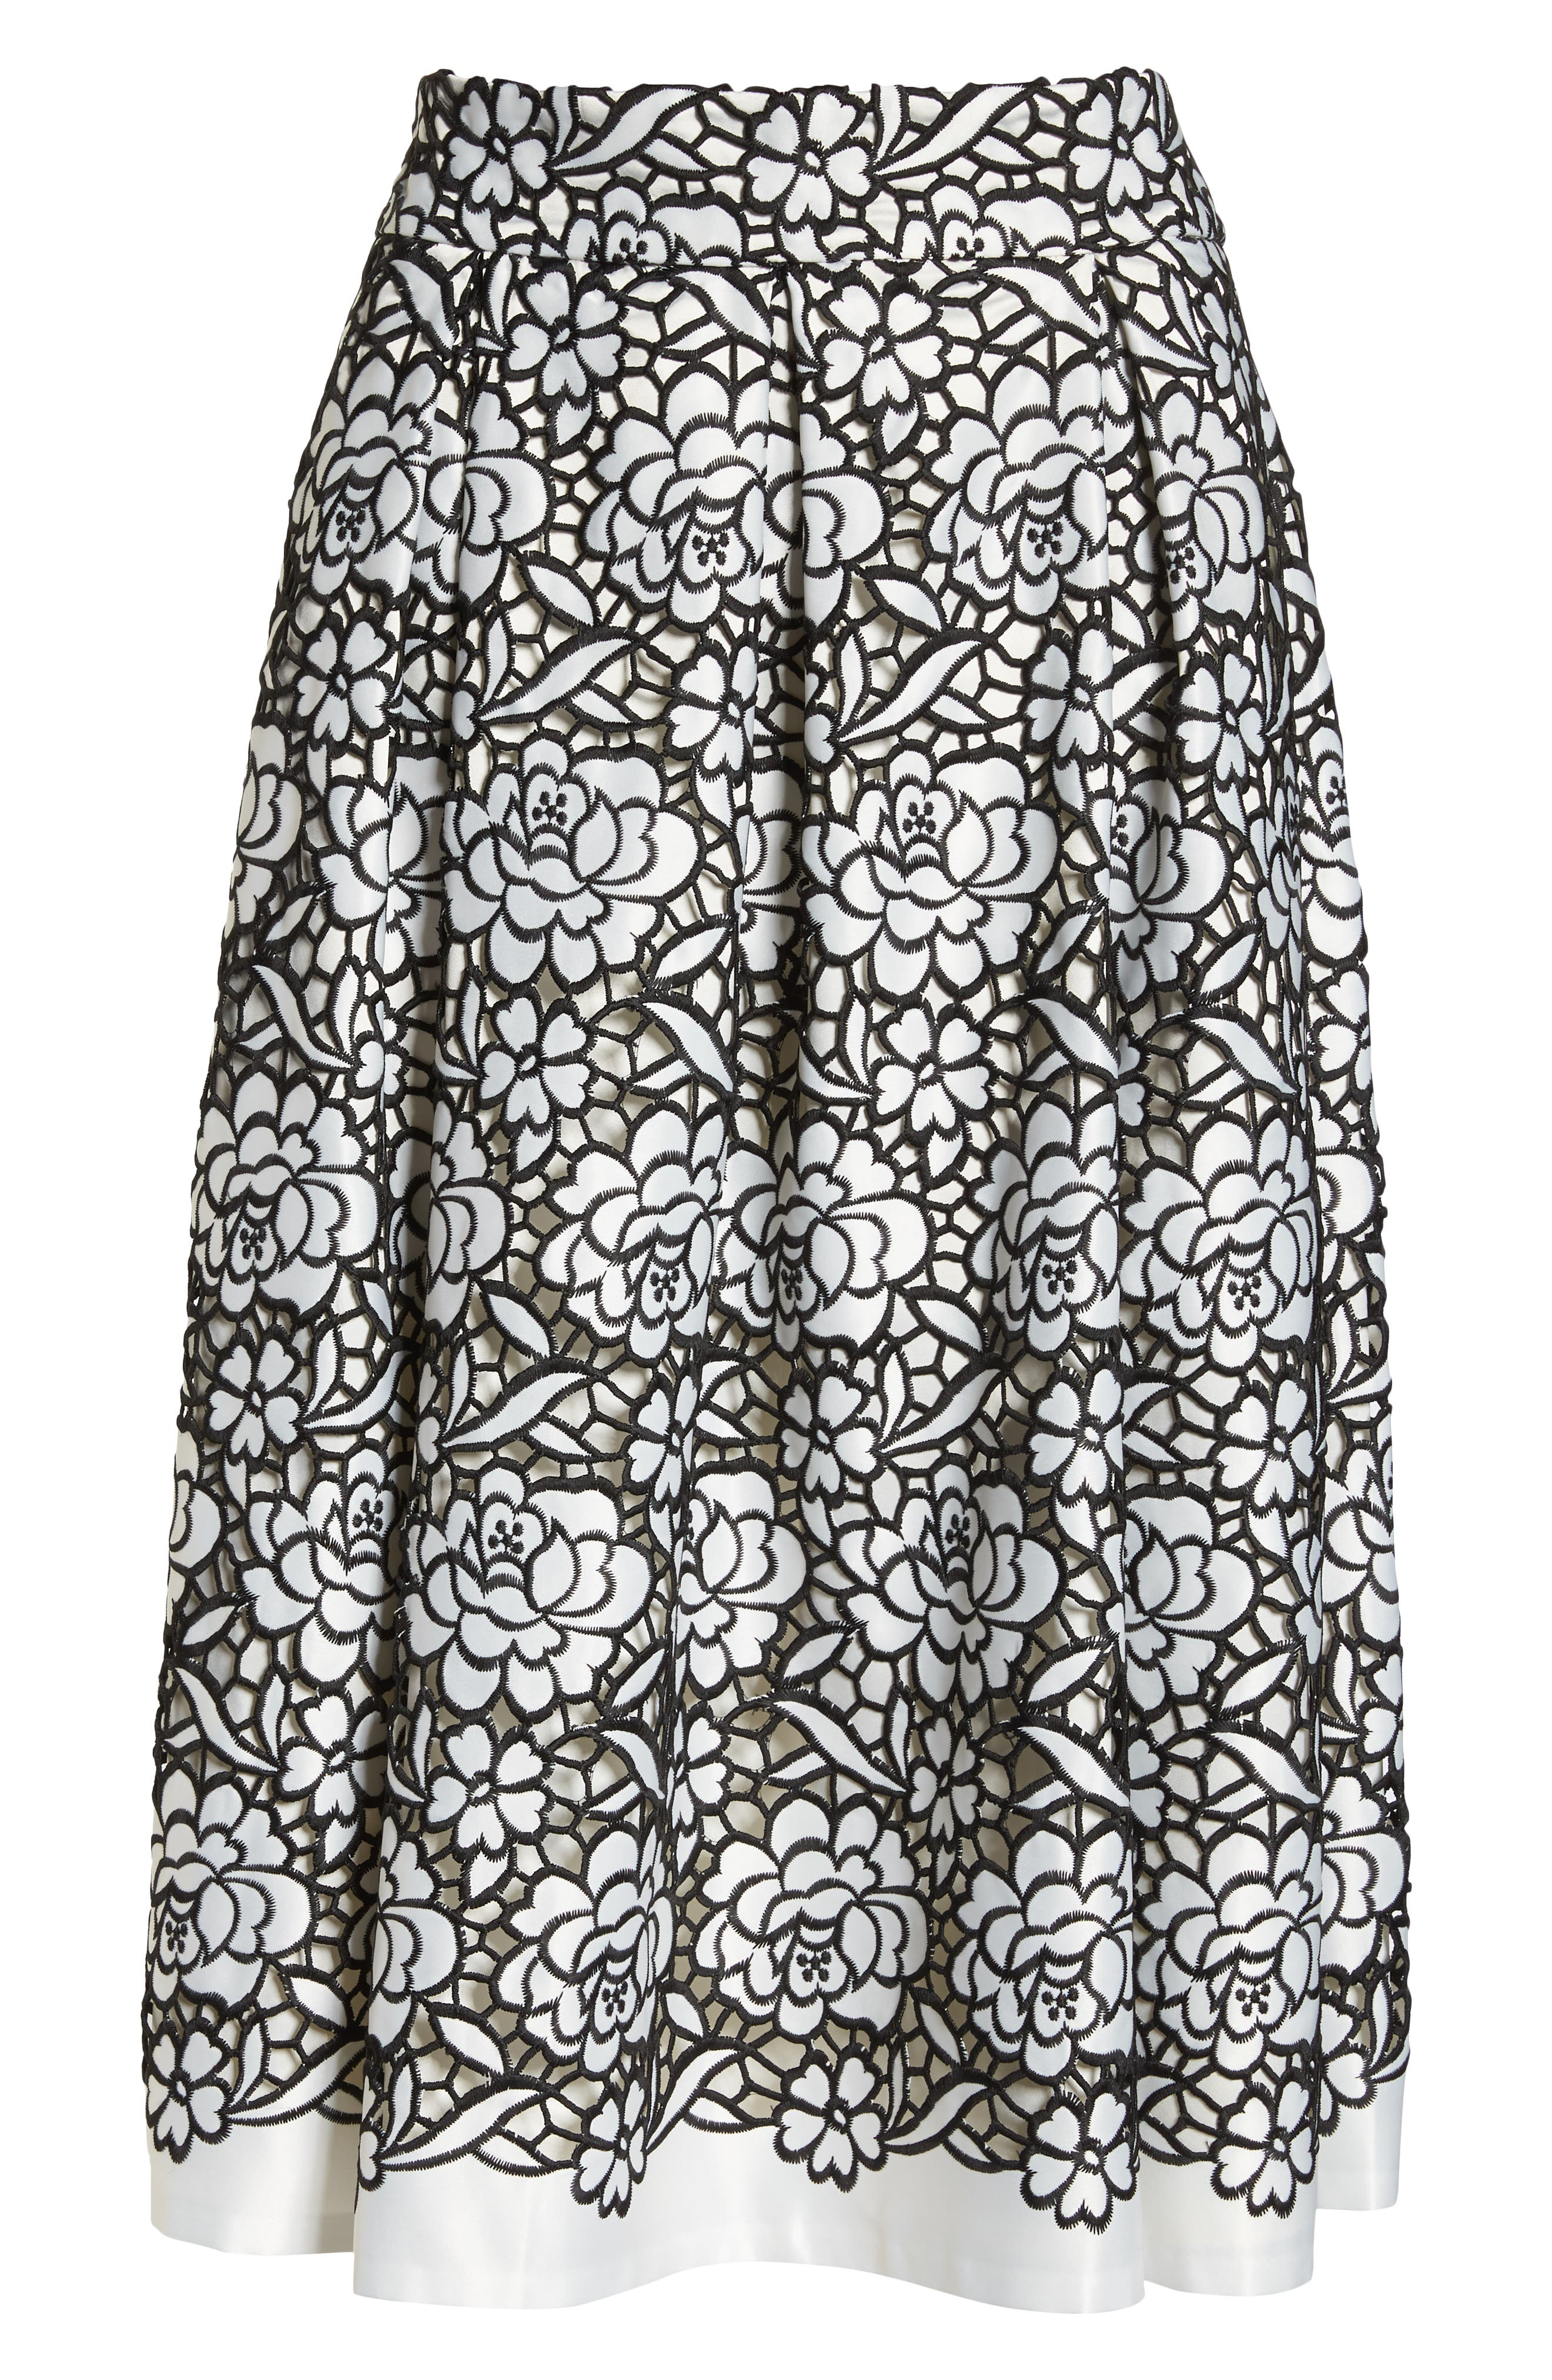 Pleated Floral Cutout Appliqué Skirt,                             Alternate thumbnail 6, color,                             BLACK/IVORY